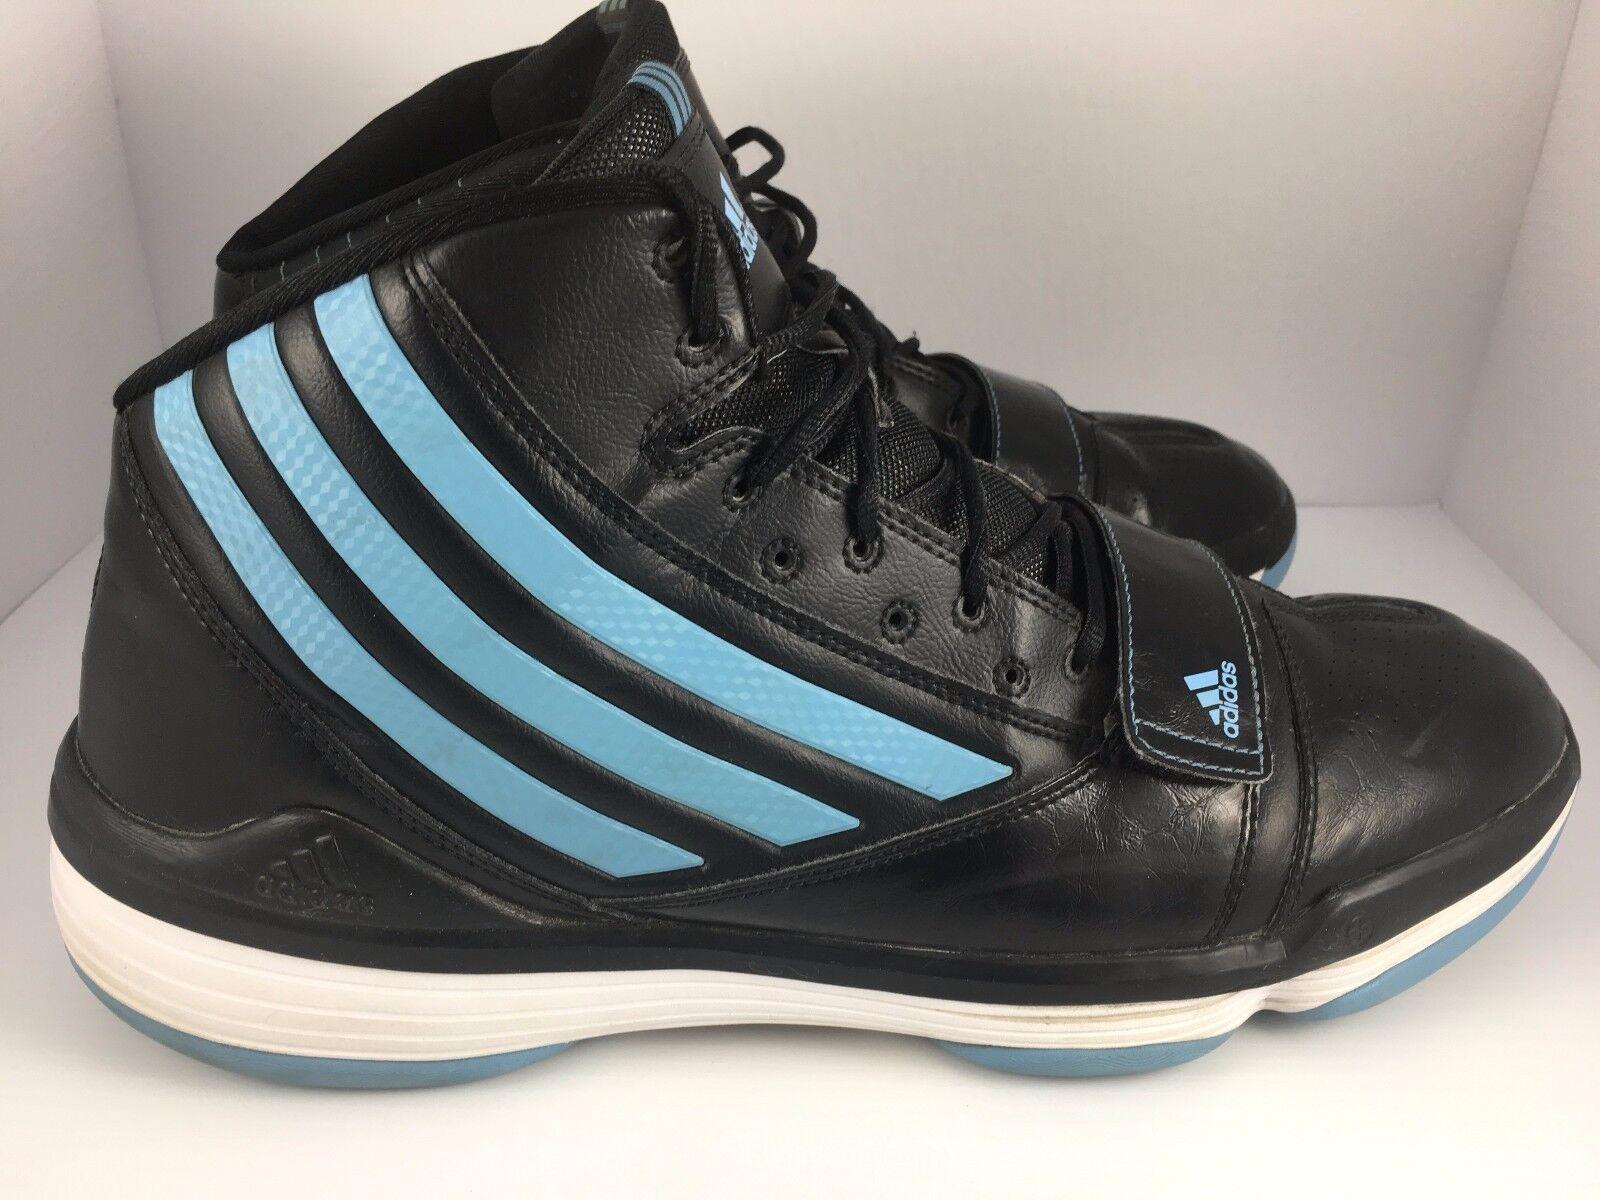 Adidas Men's Adiprene Black & Blue High Top Shoes G09506 Sz 15